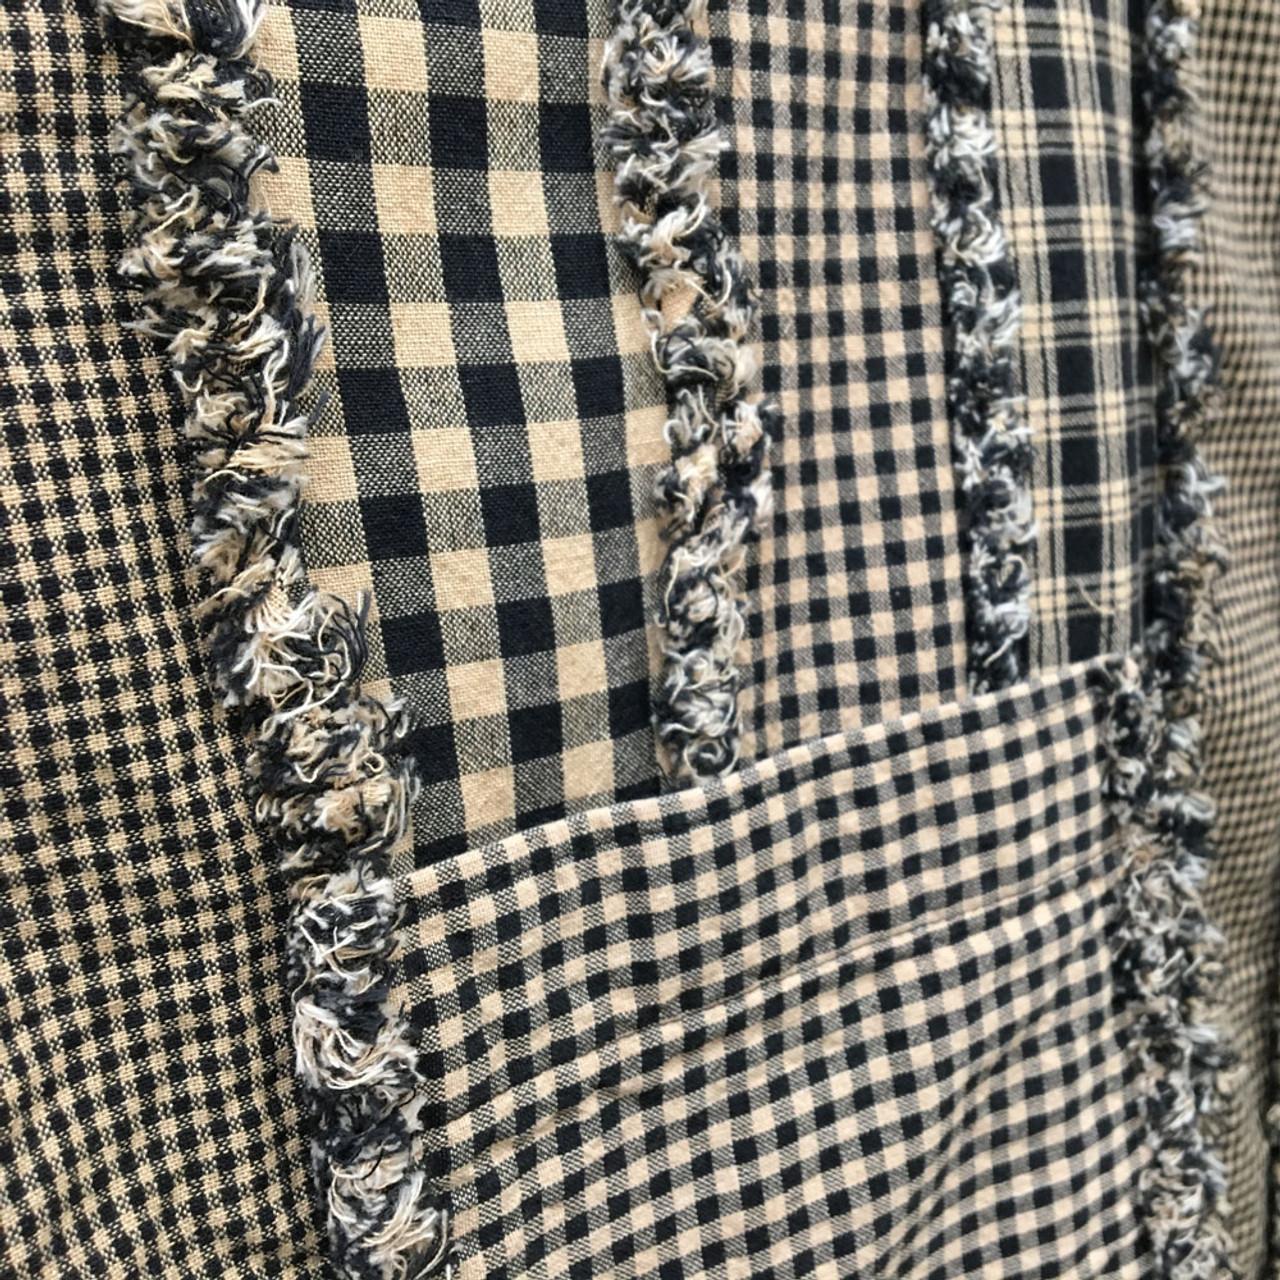 Ragged Stripe Apron Pattern - Digital